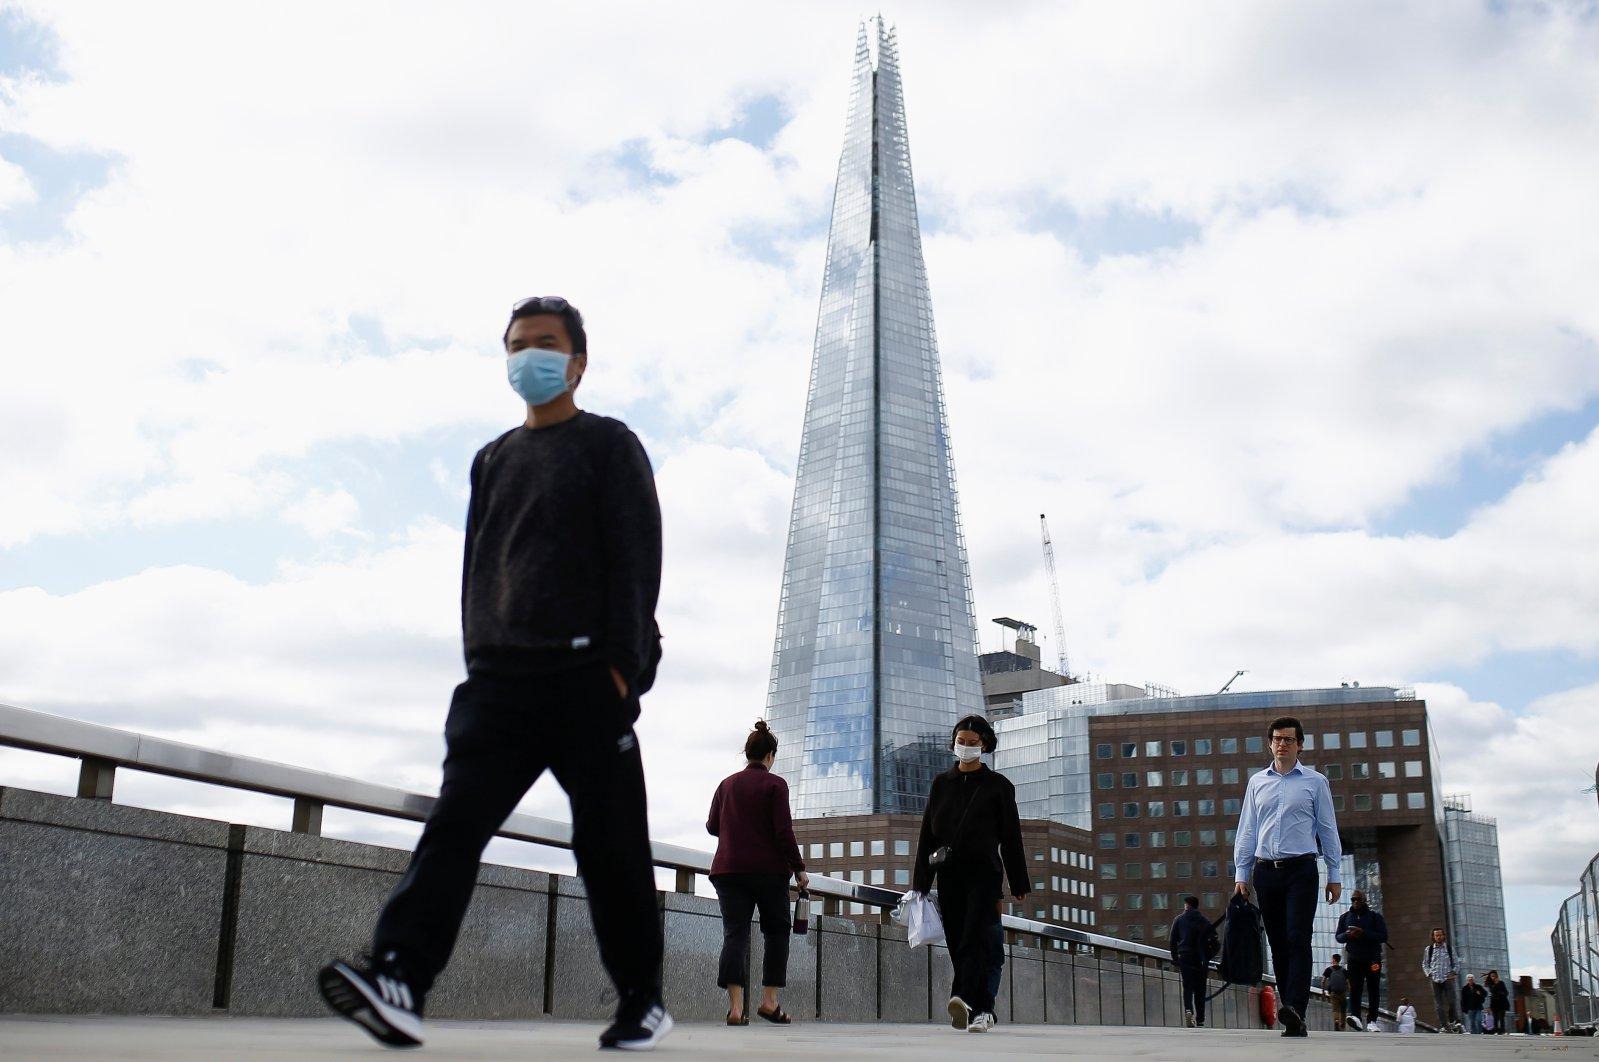 People walk over the London Bridge amid the coronavirus outbreak, London, Britain, Aug. 26, 2020. (Reuters Photo)